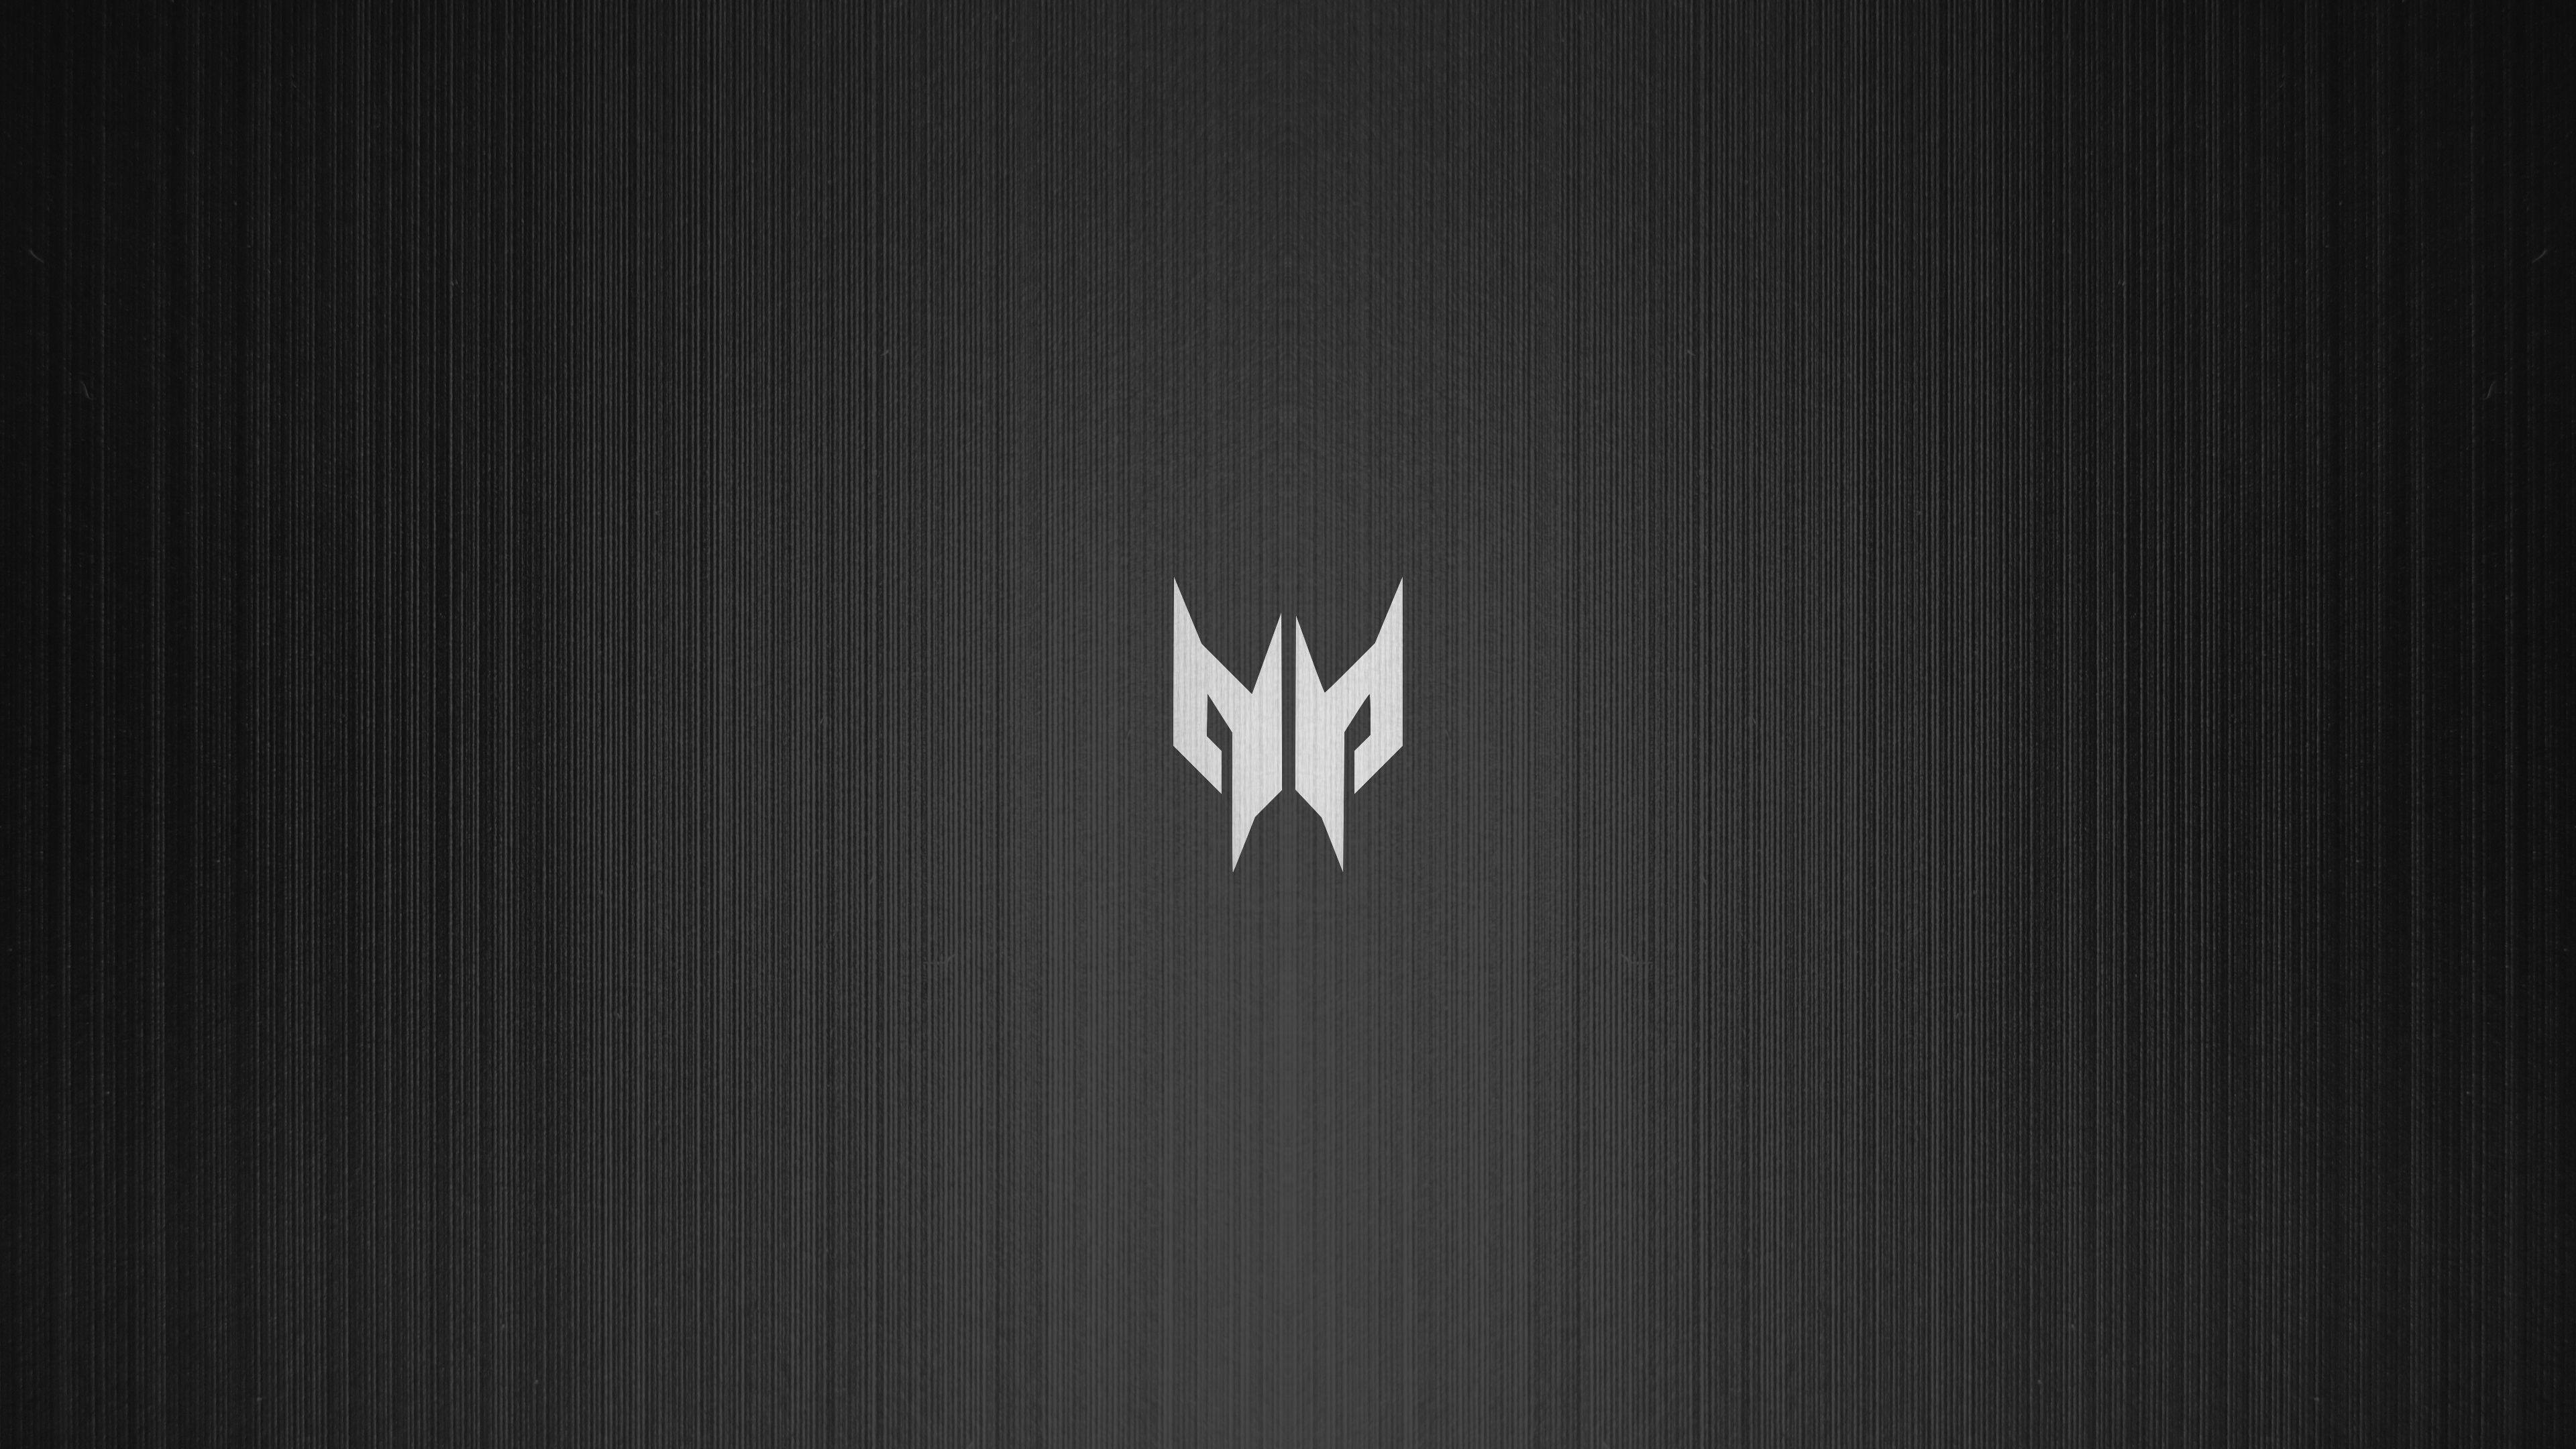 Acer Predator Silver Logo 4k 17082 Silver Logo 4k Wallpapers For Pc Predator